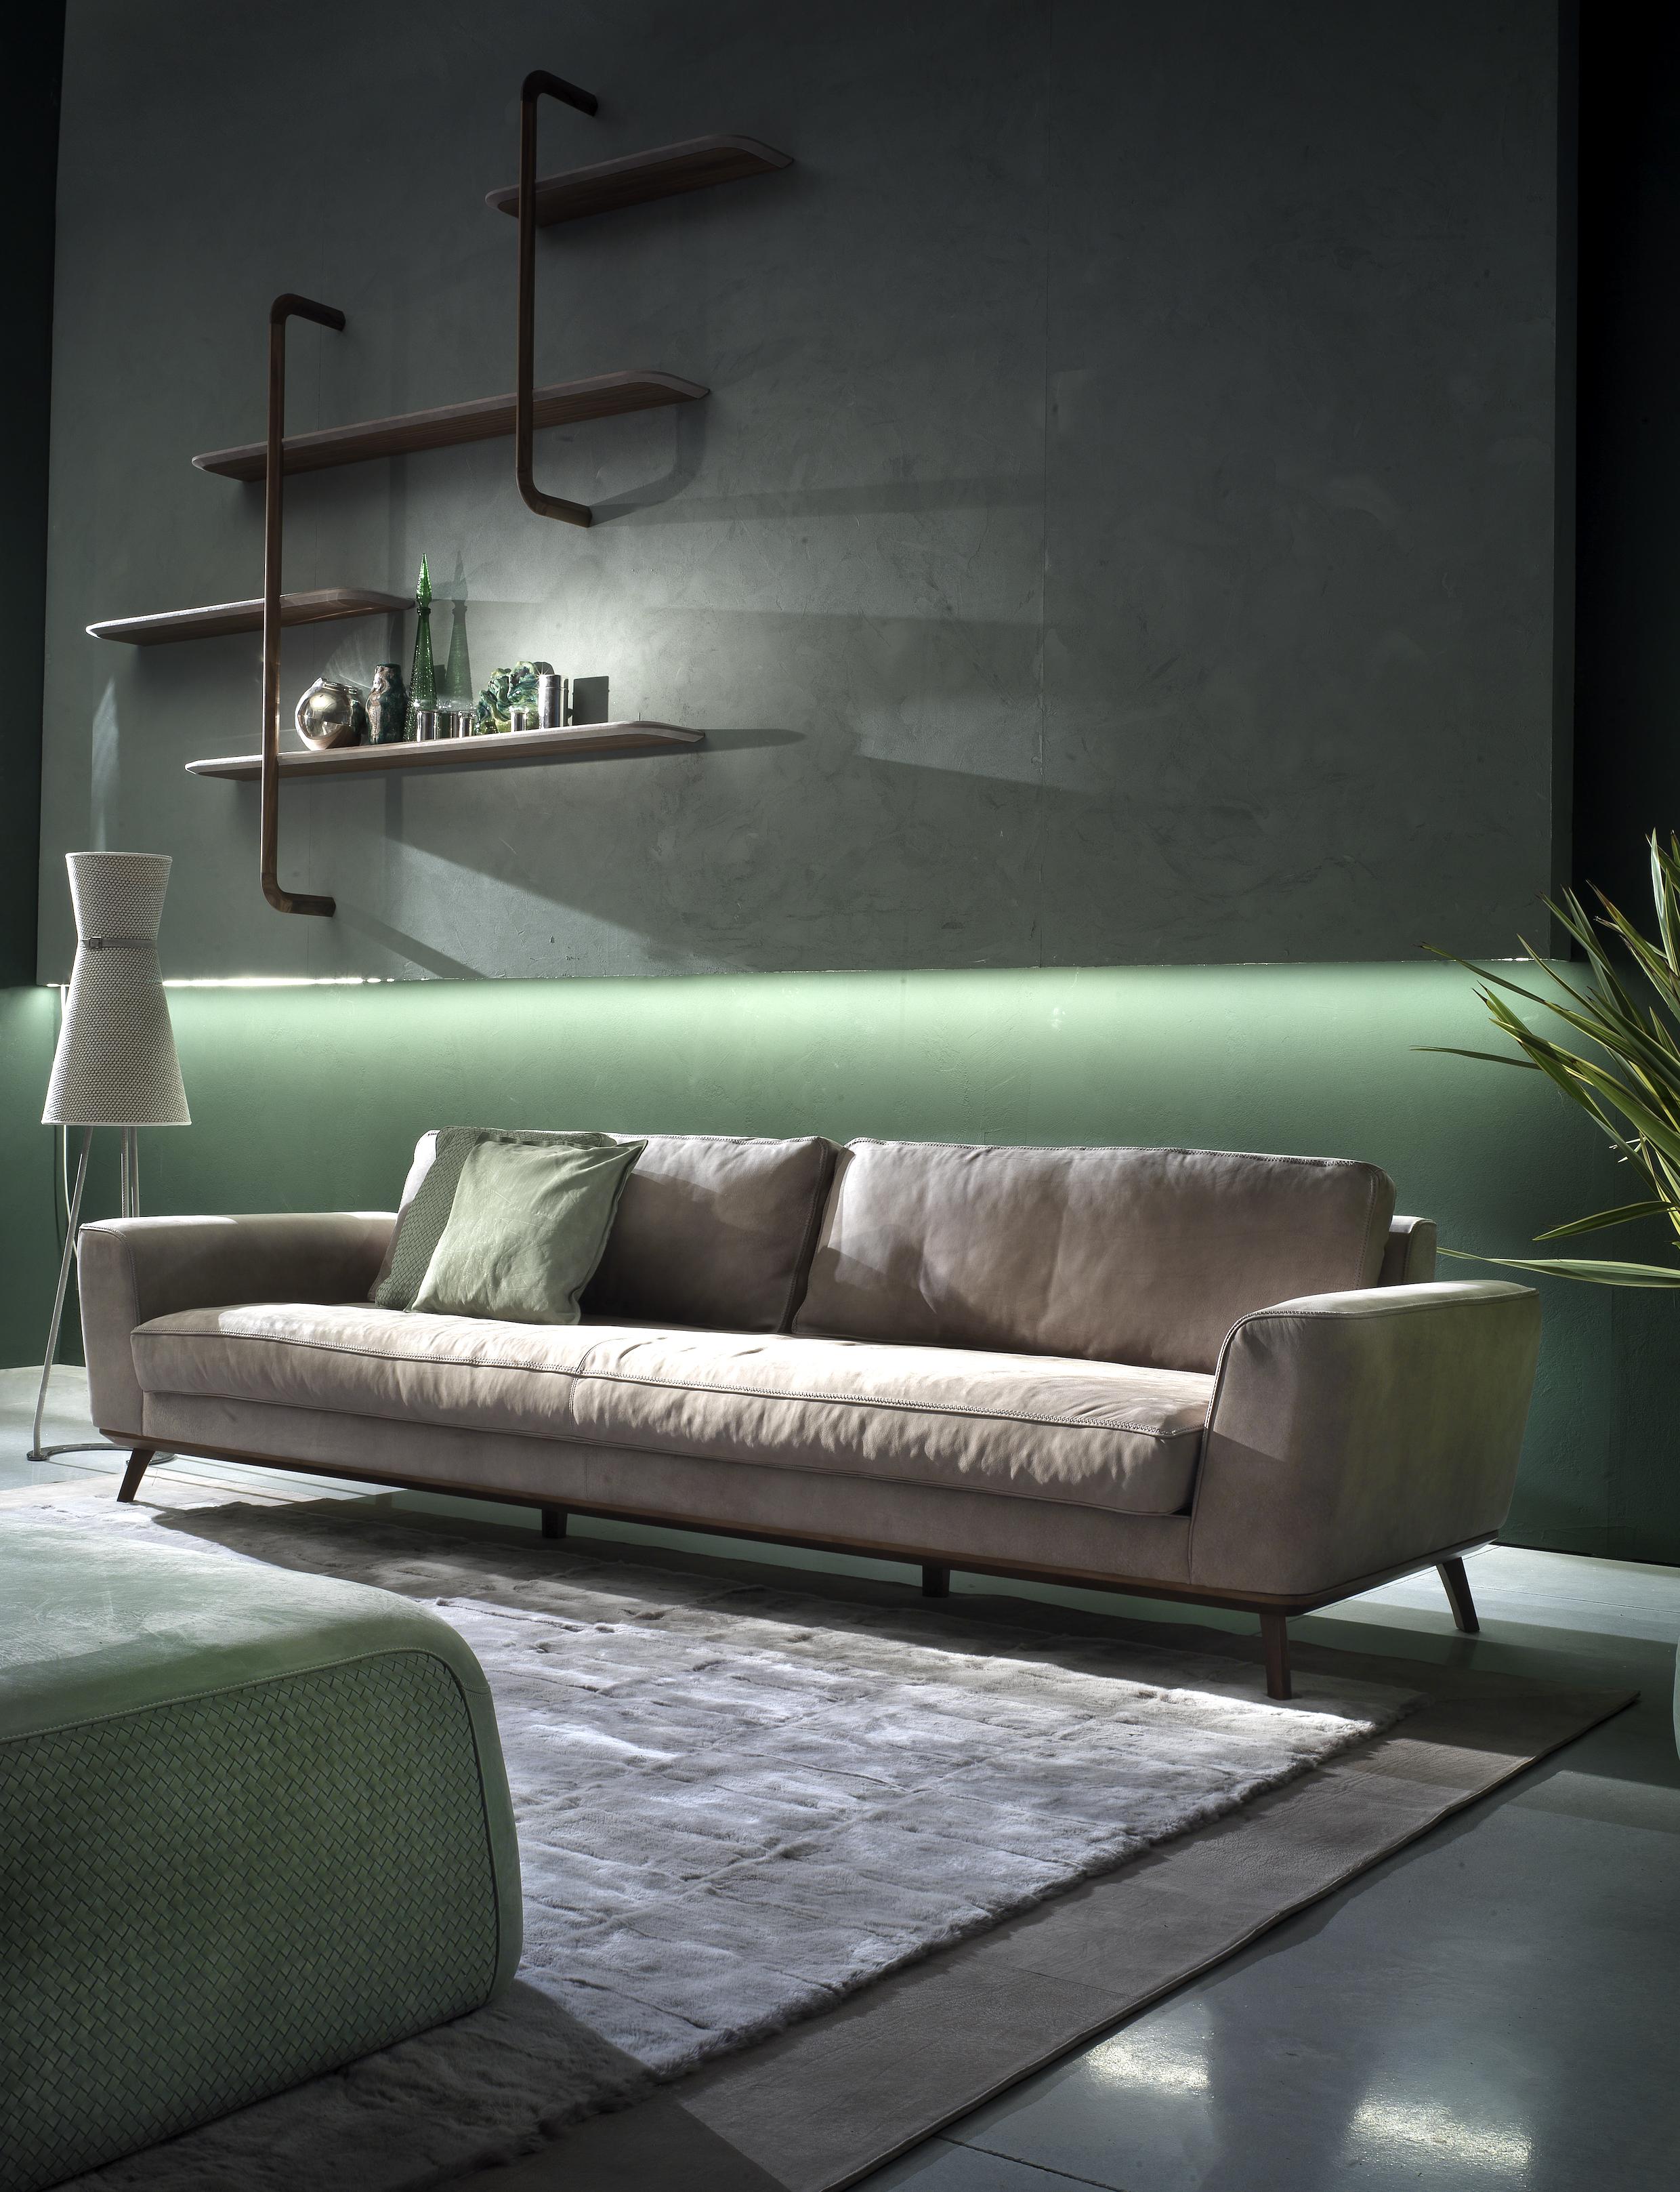 Ulivi Salotti - Robert contemporary leather sofa - Masha Shapiro Agency.jpg